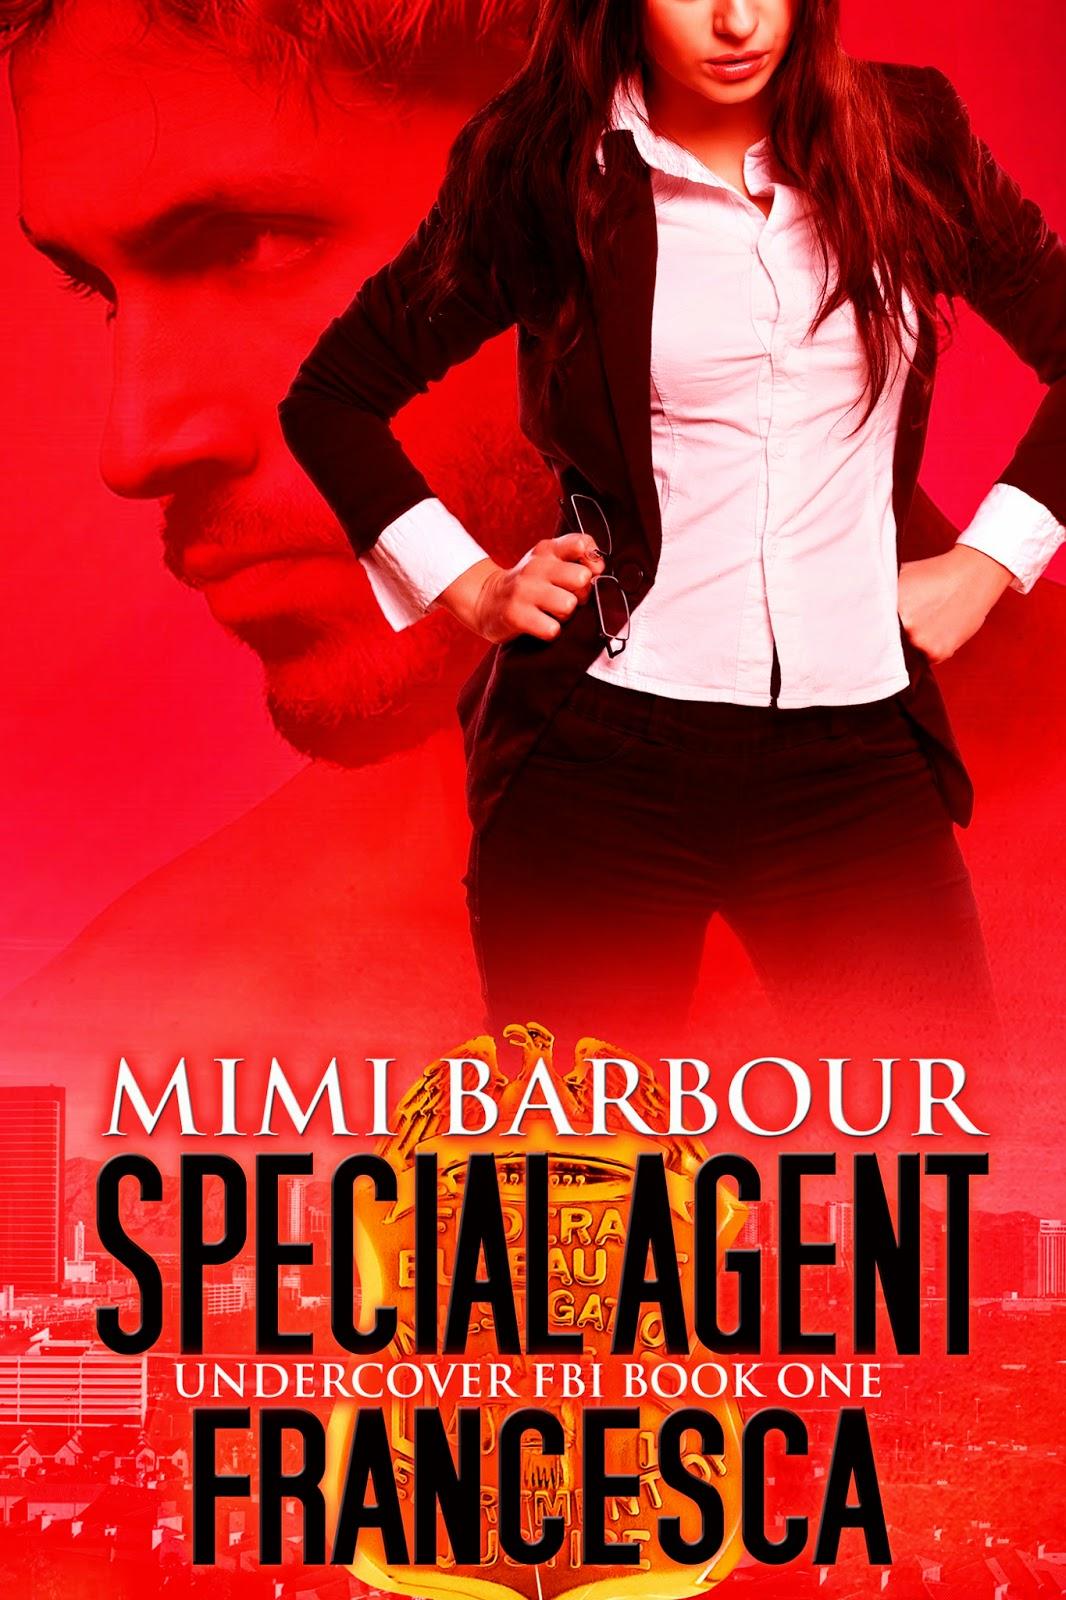 Interview with romantic suspense author Mimi Barbour